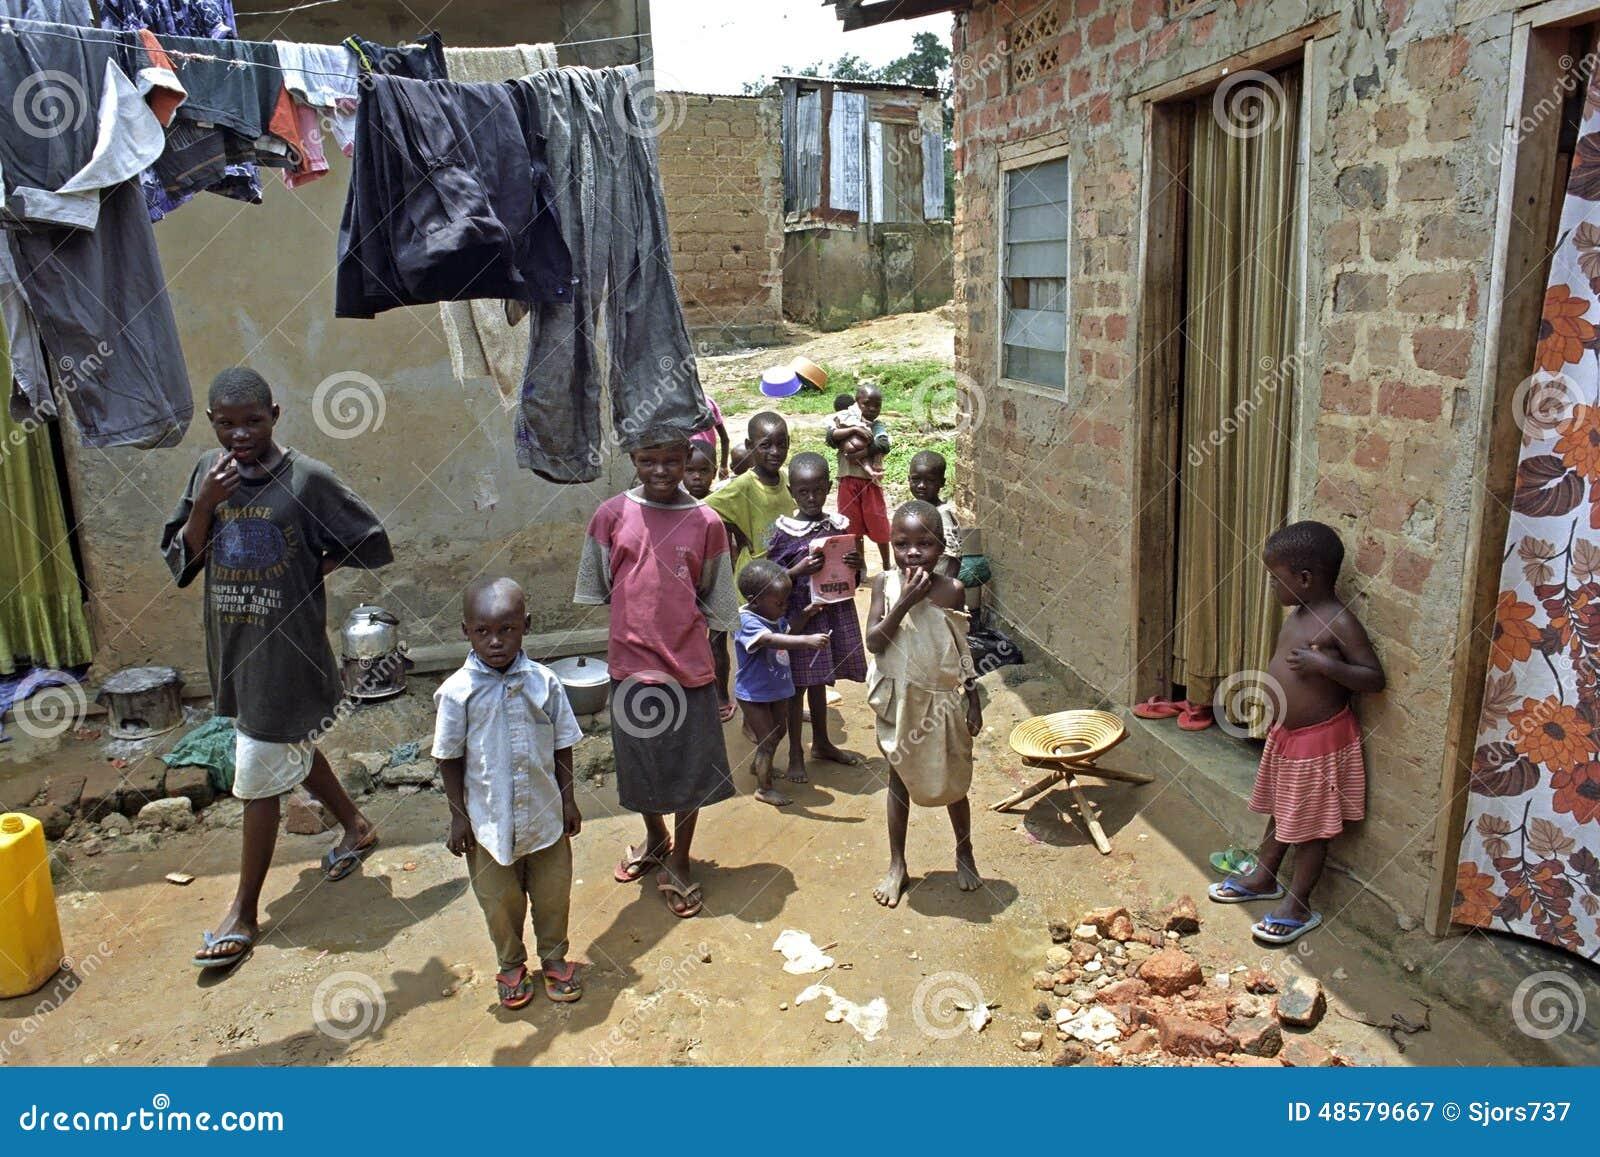 Playing Ugandan Children In A Slum In Kampala Editorial